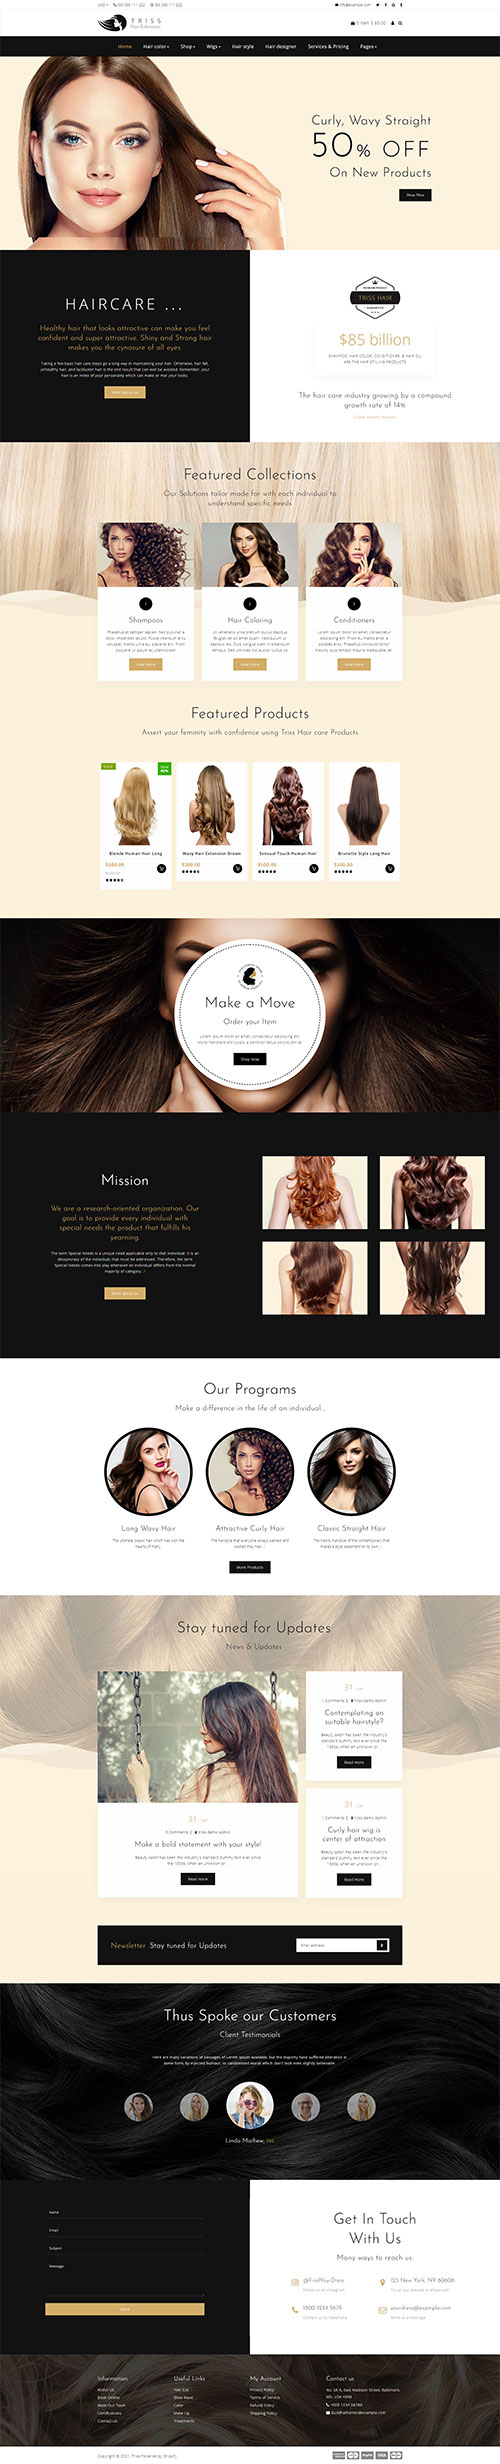 web-salon-toc-chuyen-nghiep